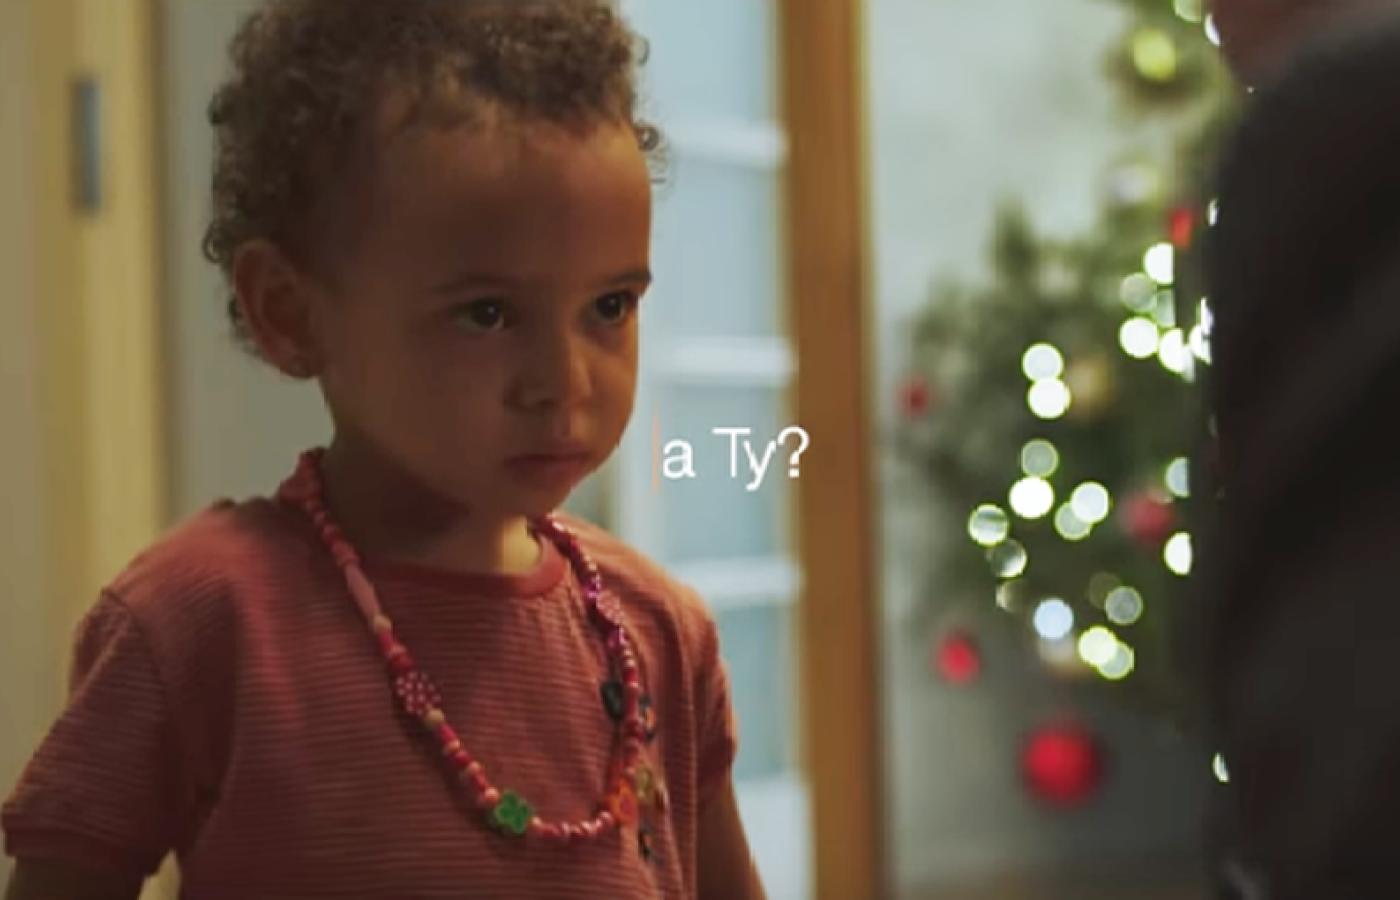 Nowa Reklama Allegro Powiela Stereotypy